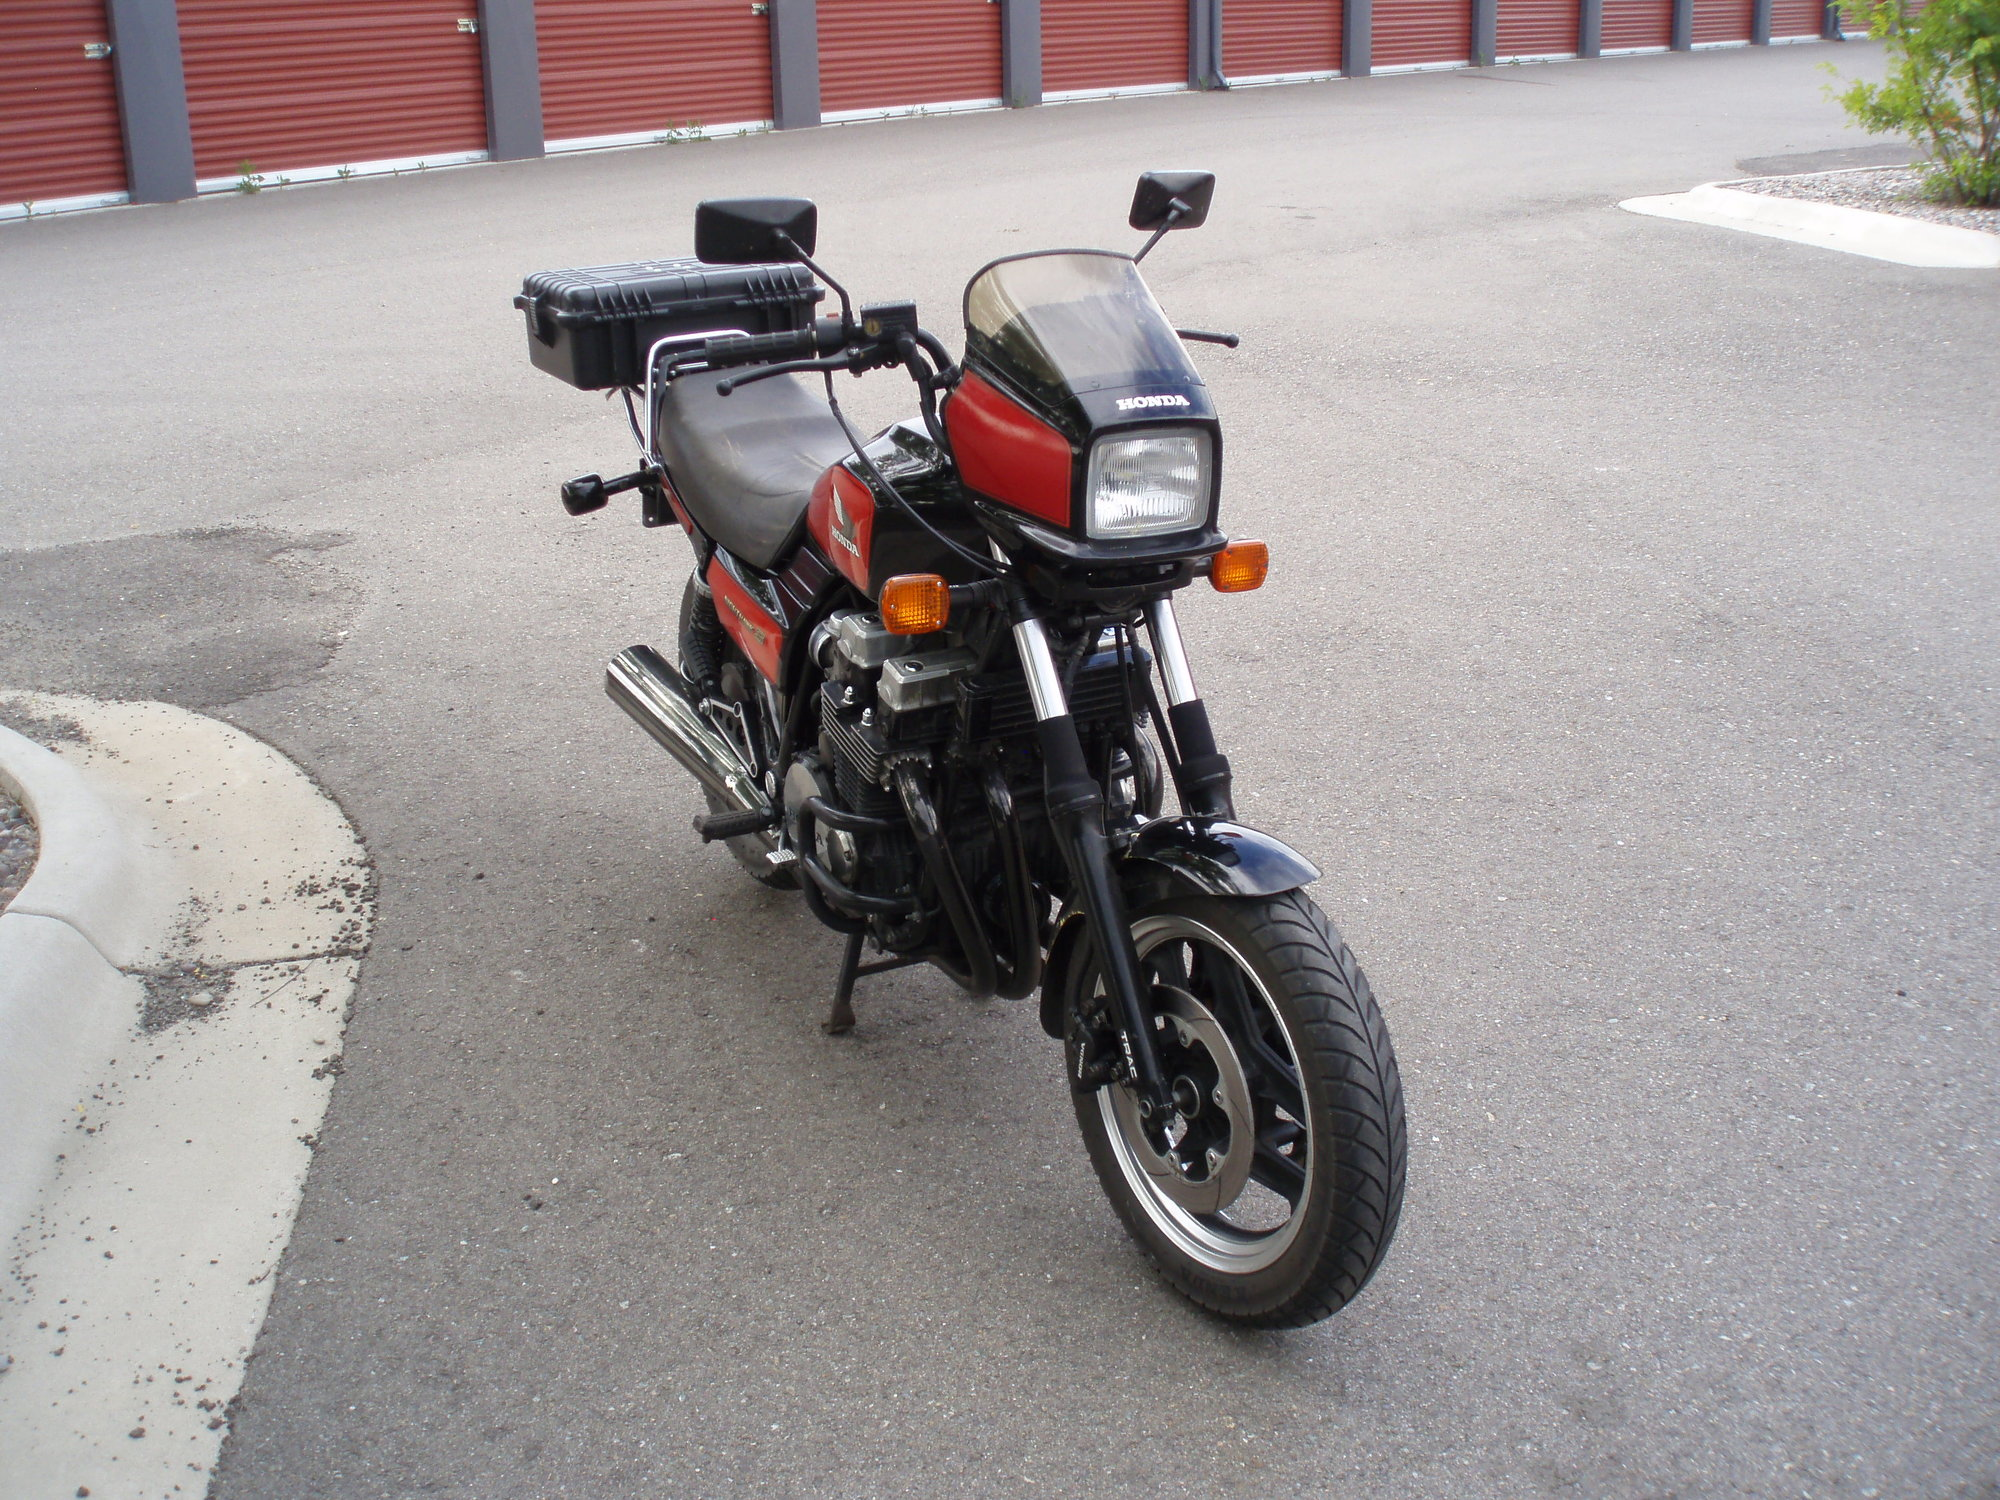 P7170005.JPG